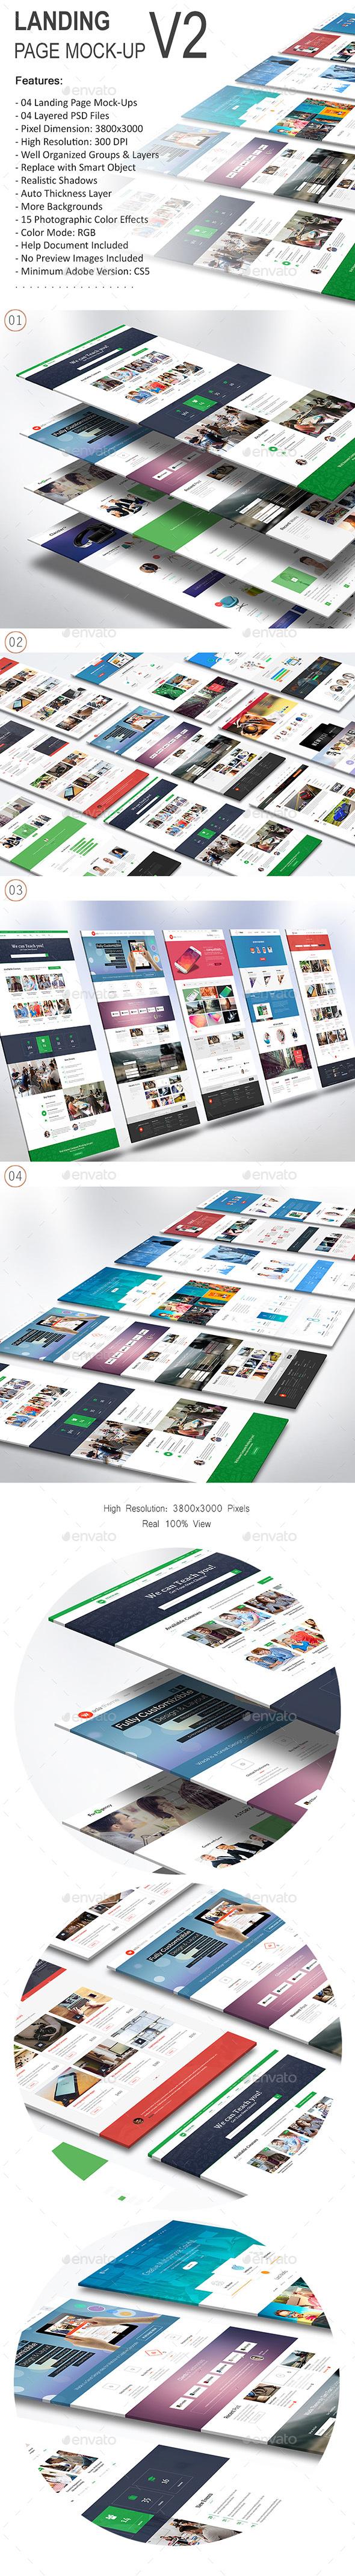 Landing Page Mock-Up 02 - Website Displays